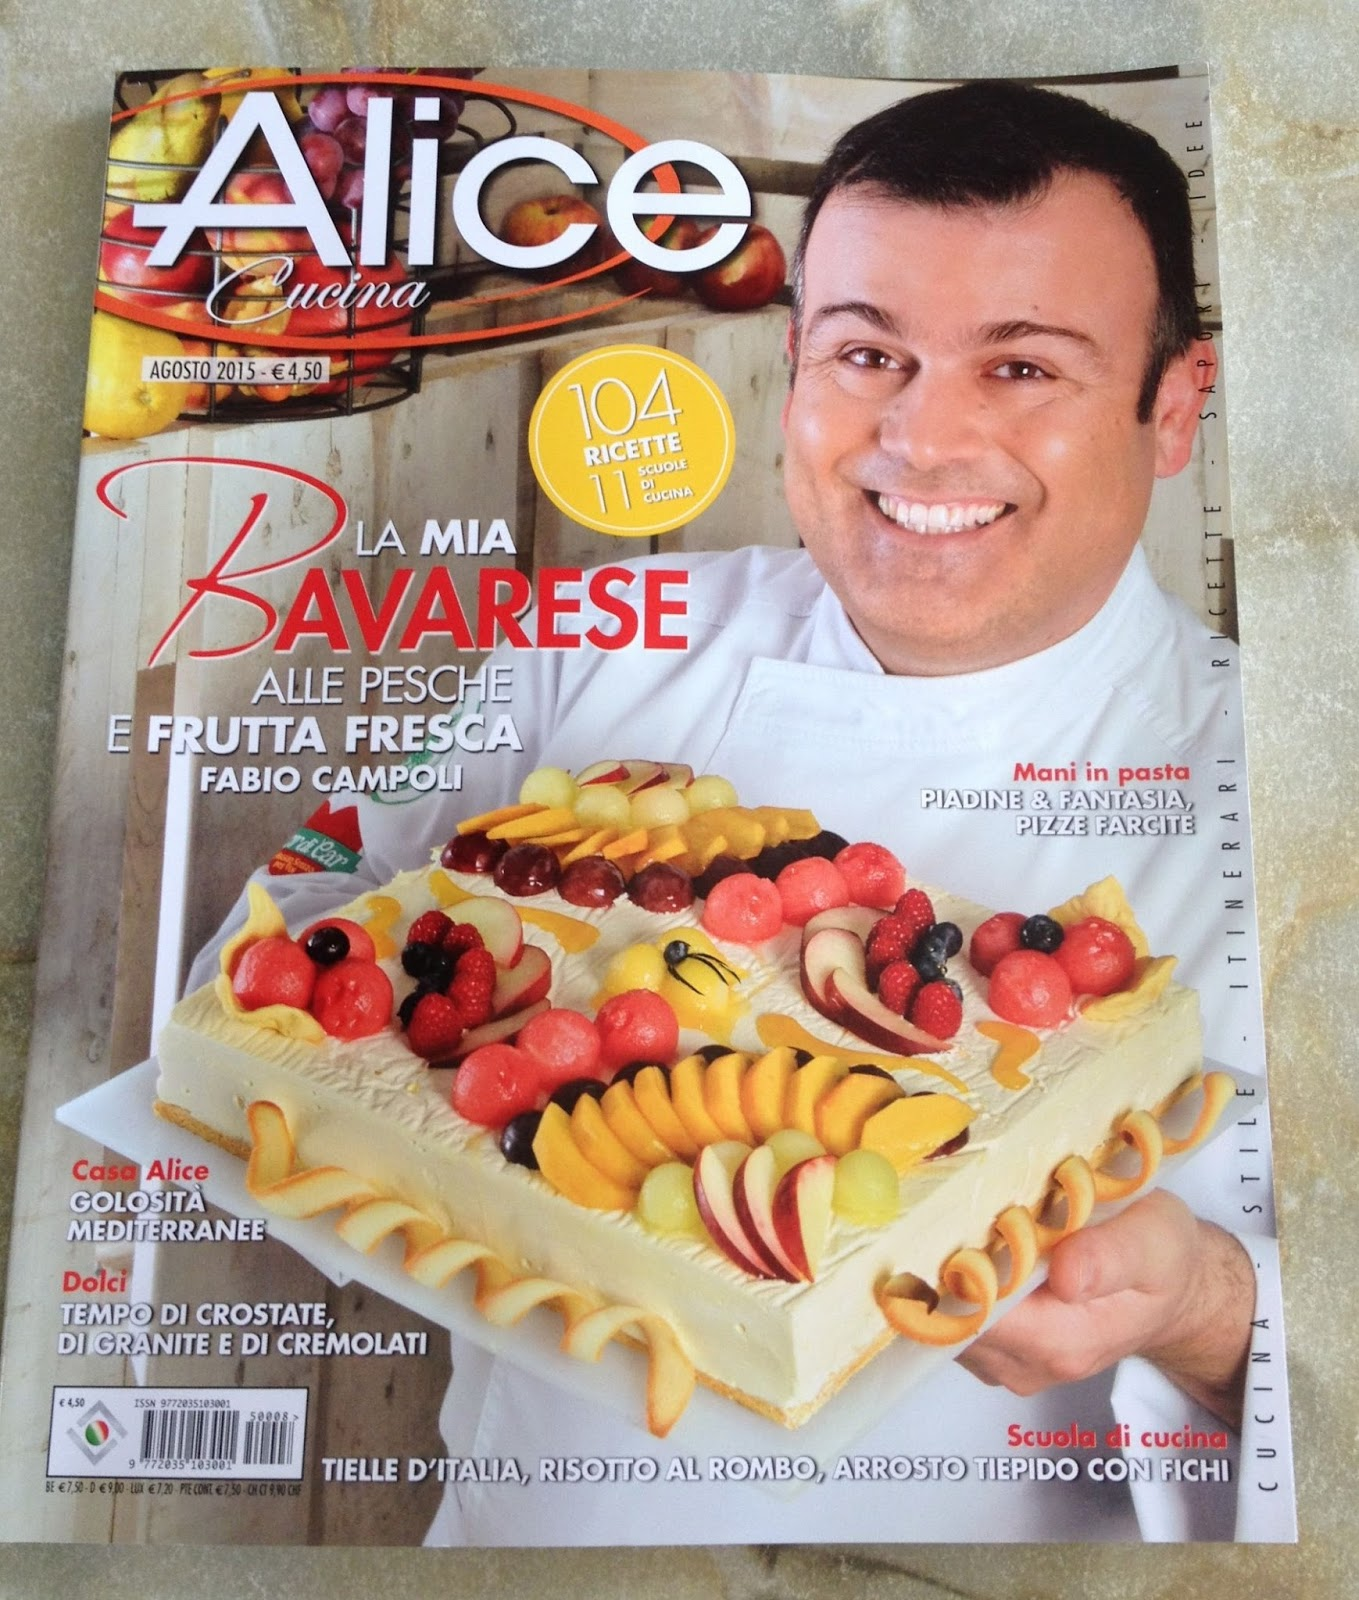 Alice cucina ricette dolci